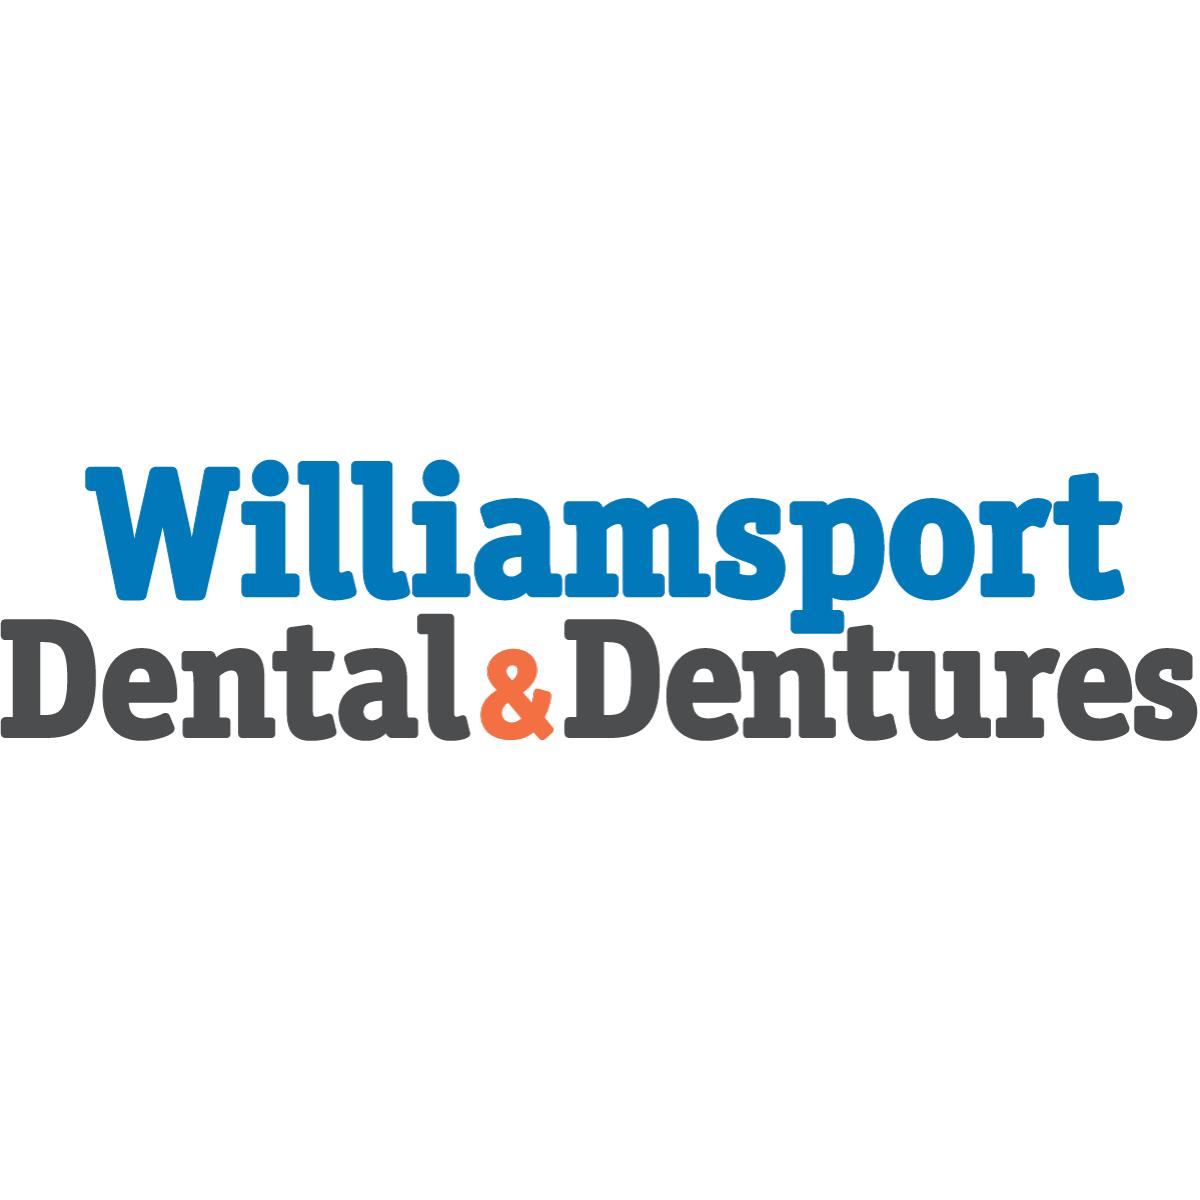 Williamsport Dental & Dentures image 3